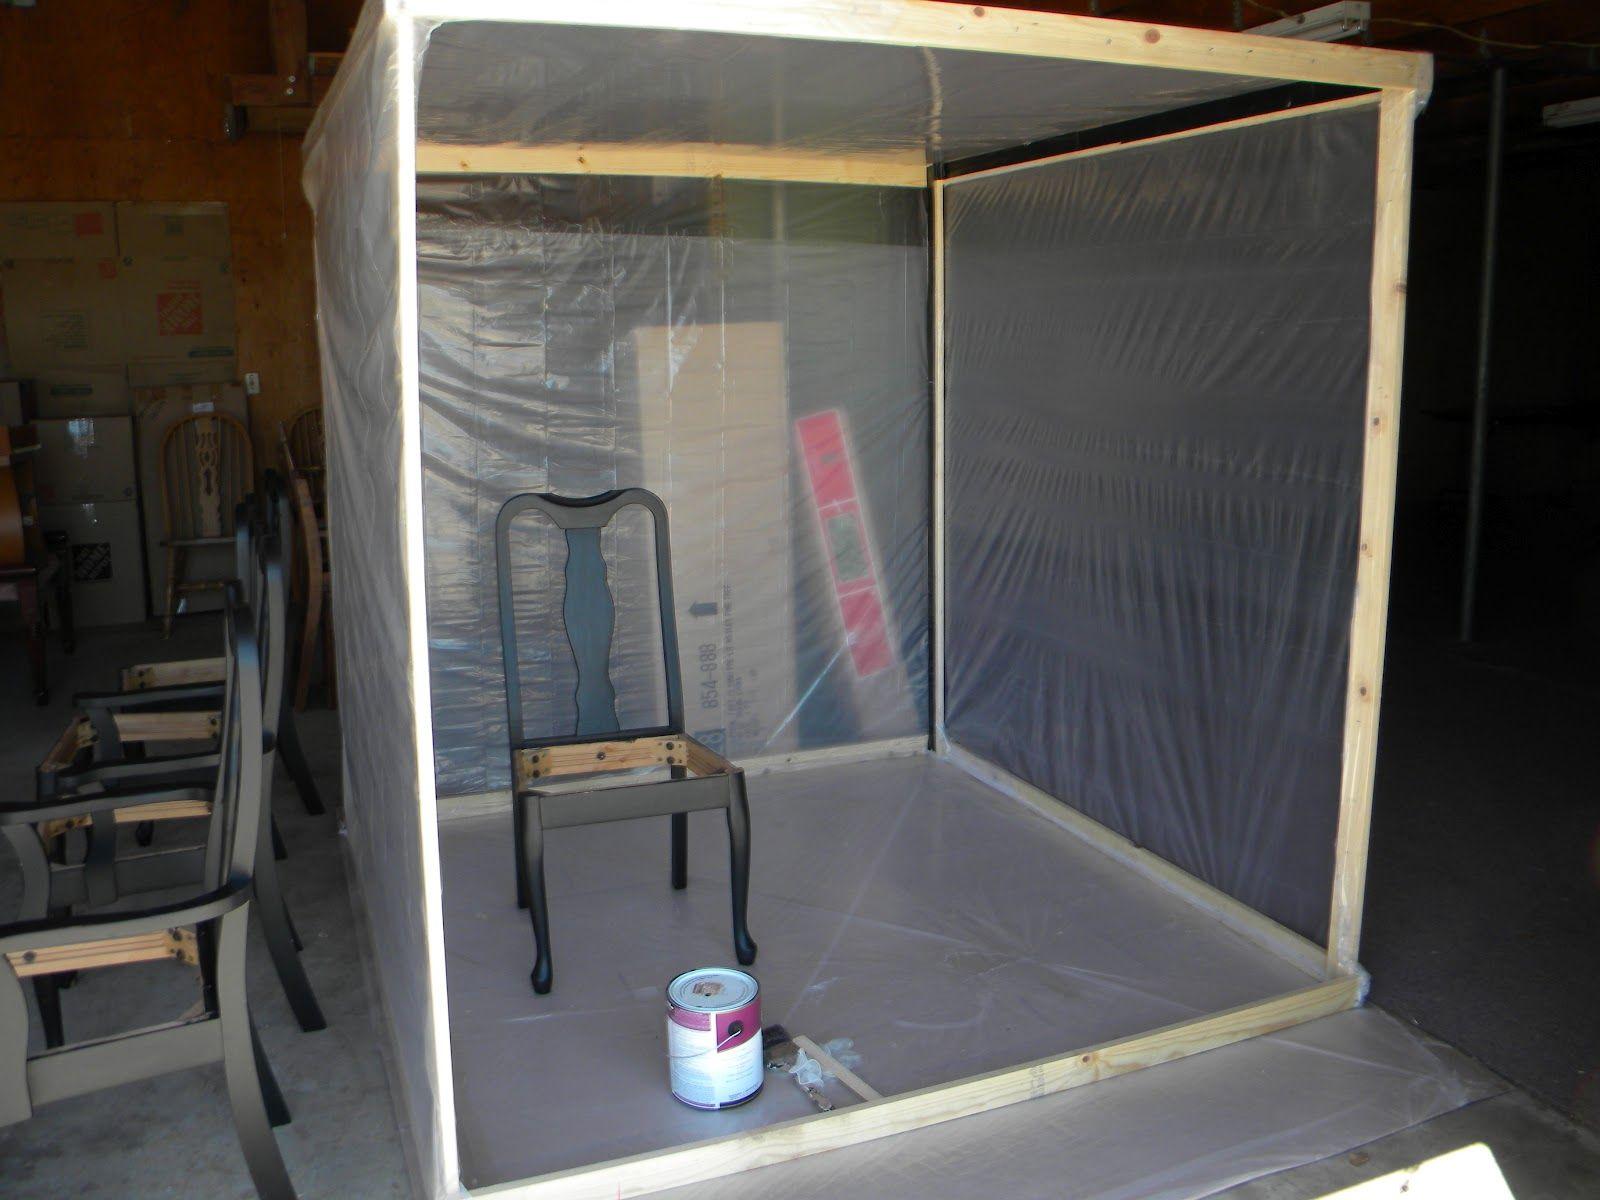 Beautiful Garage Paint Booth 8 Diy Garage Paint Booth Garage Paint Paint Booth Diy Paint Booth